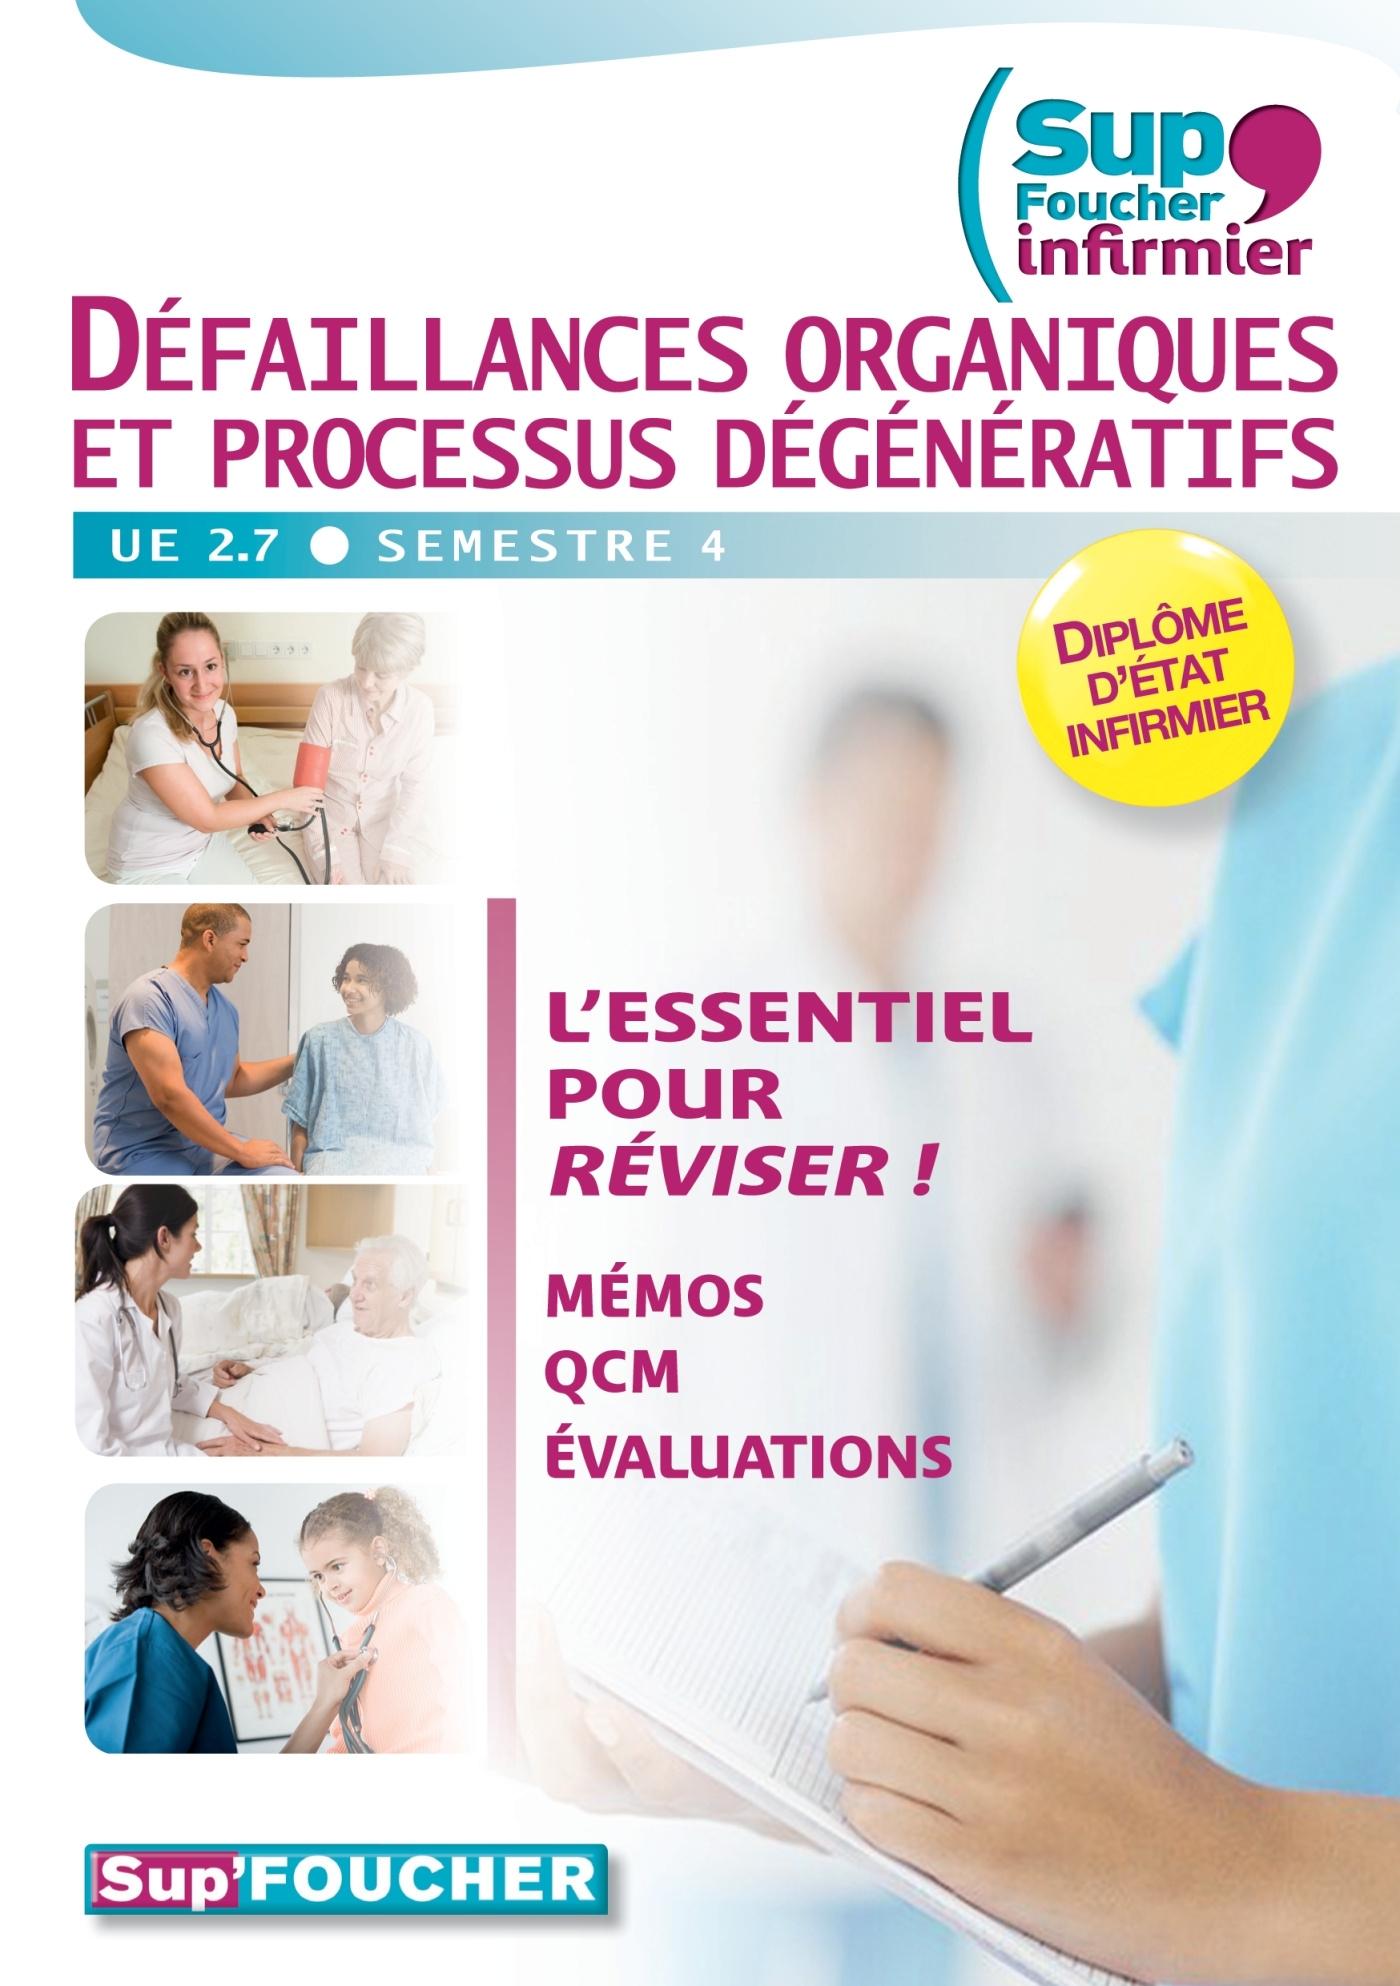 DEFAILLANCES ORGANIQUES ET PROCESSUS DEGENERATIFS UE 2.7 - SEMESTRE 4